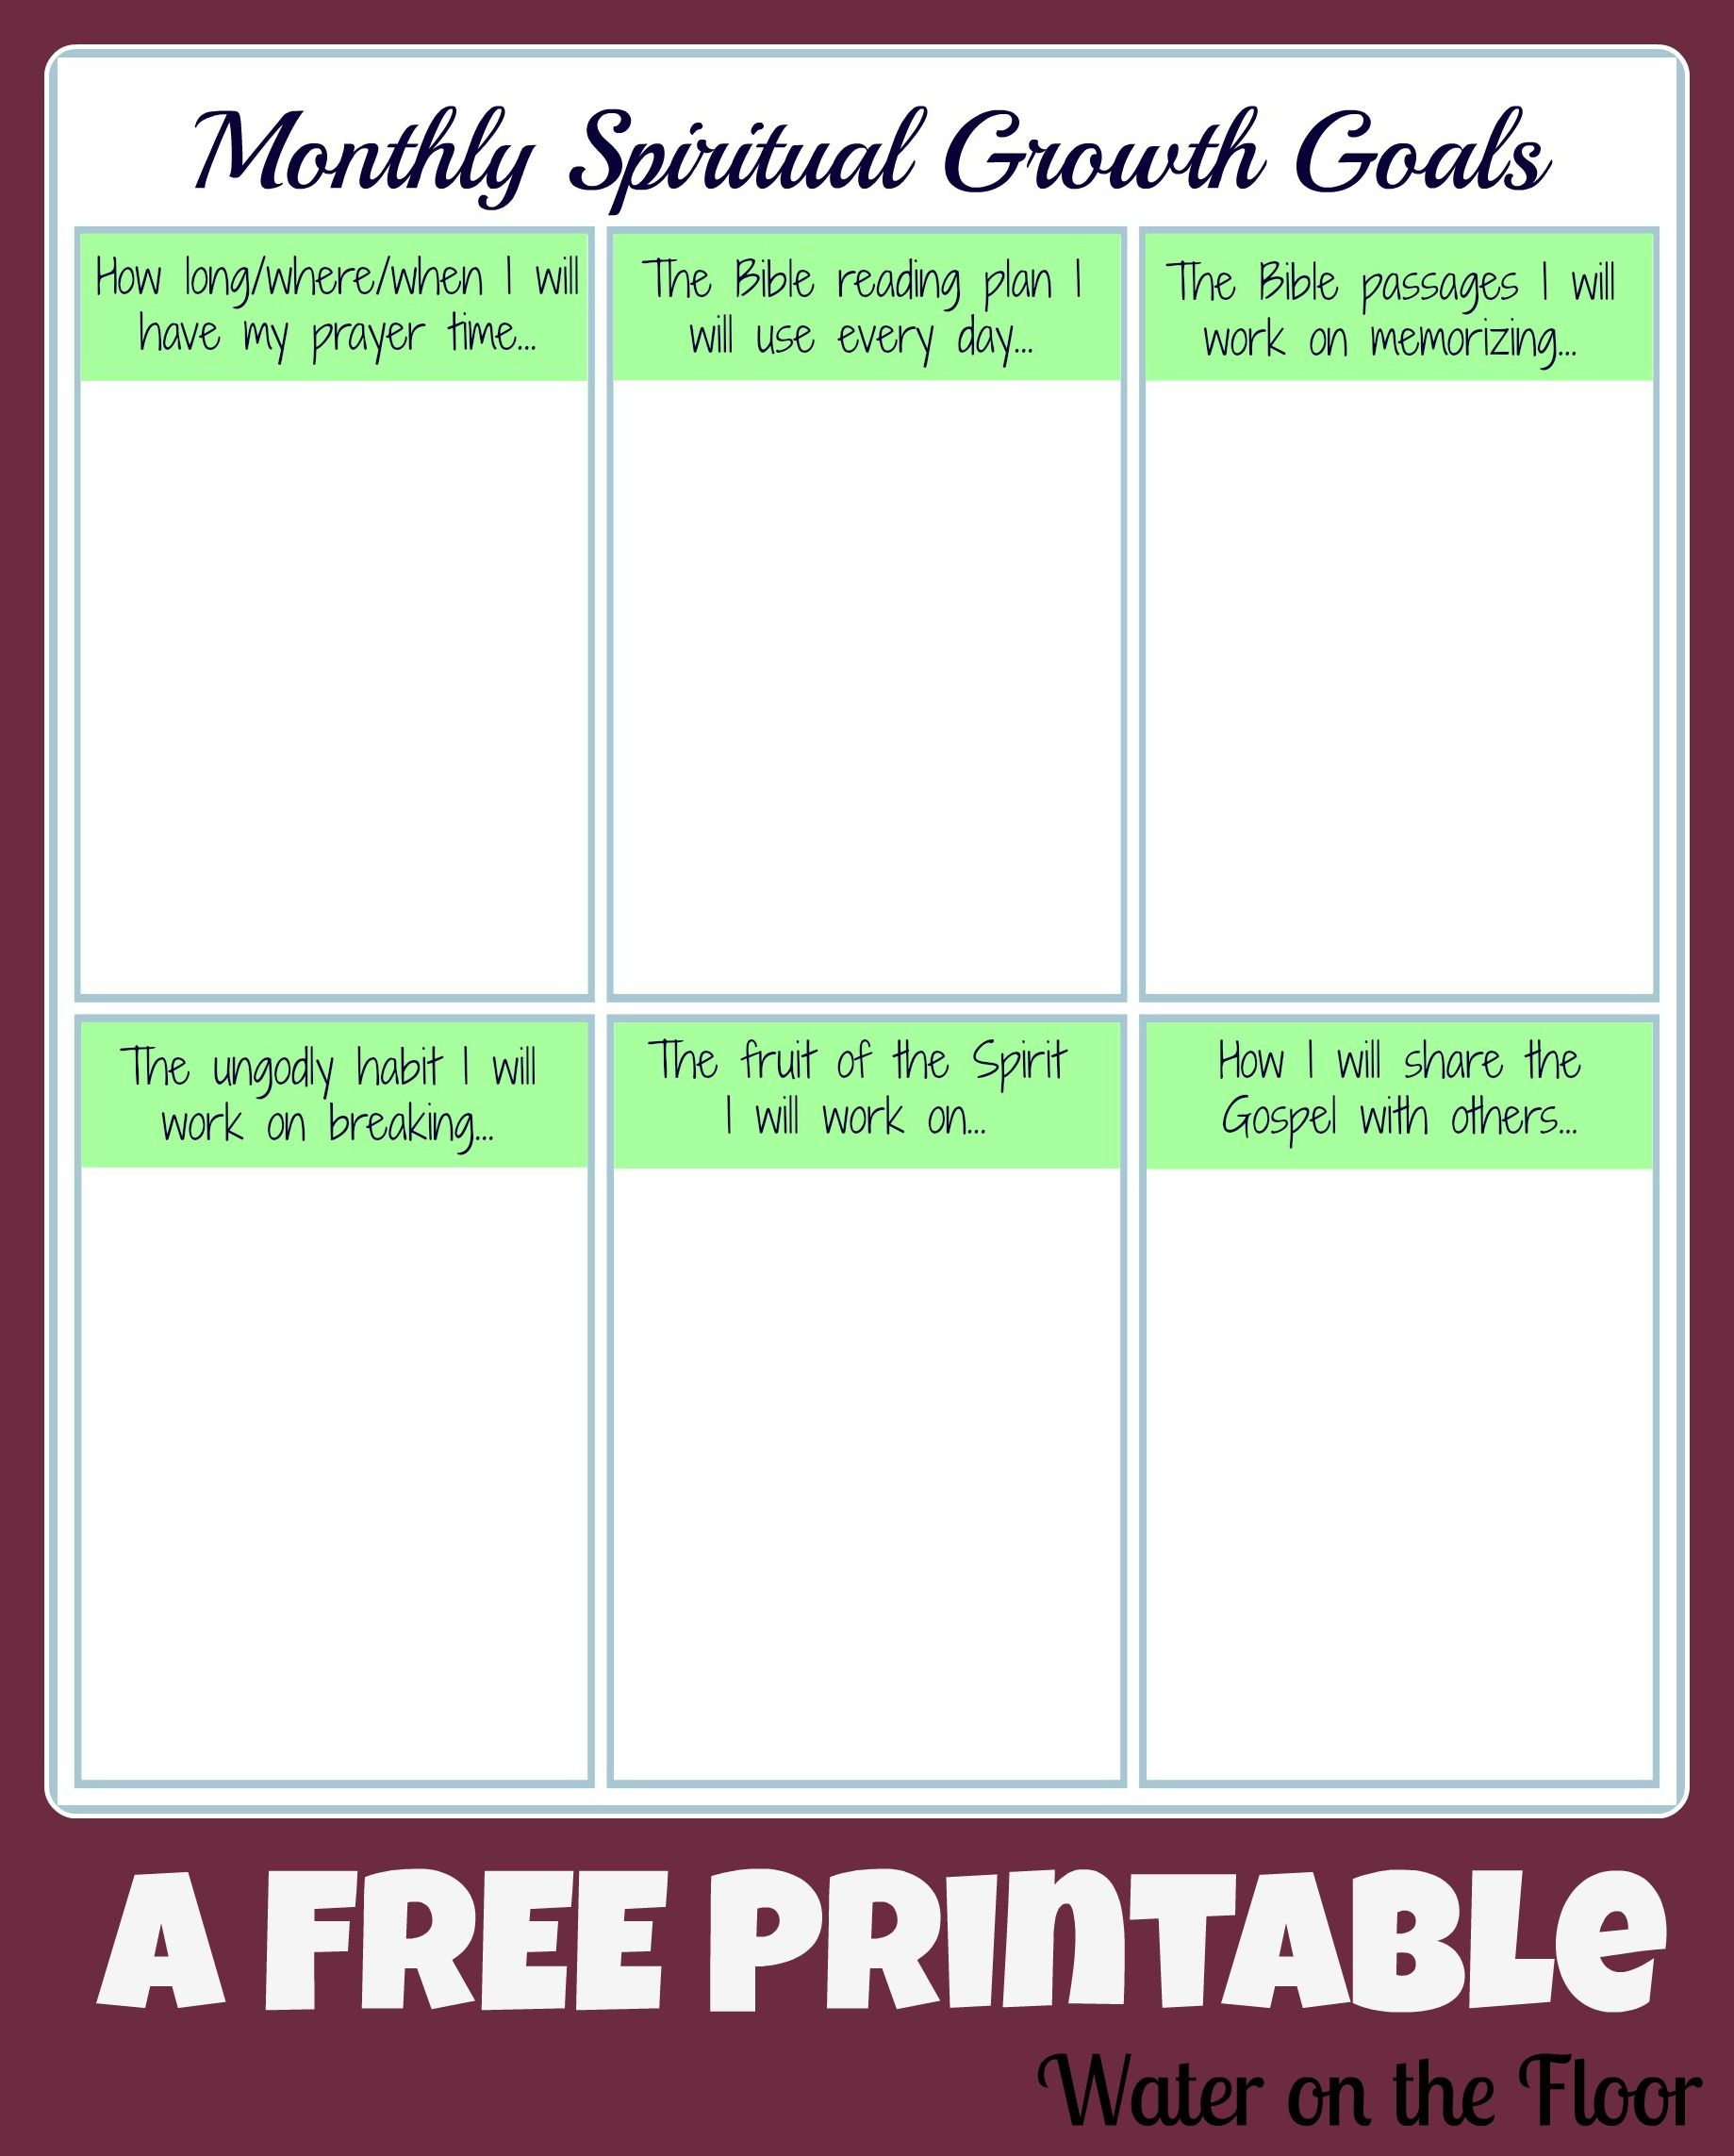 Monthly Spiritual Growth Goals (FREE Printable) | Spiritual growth ...